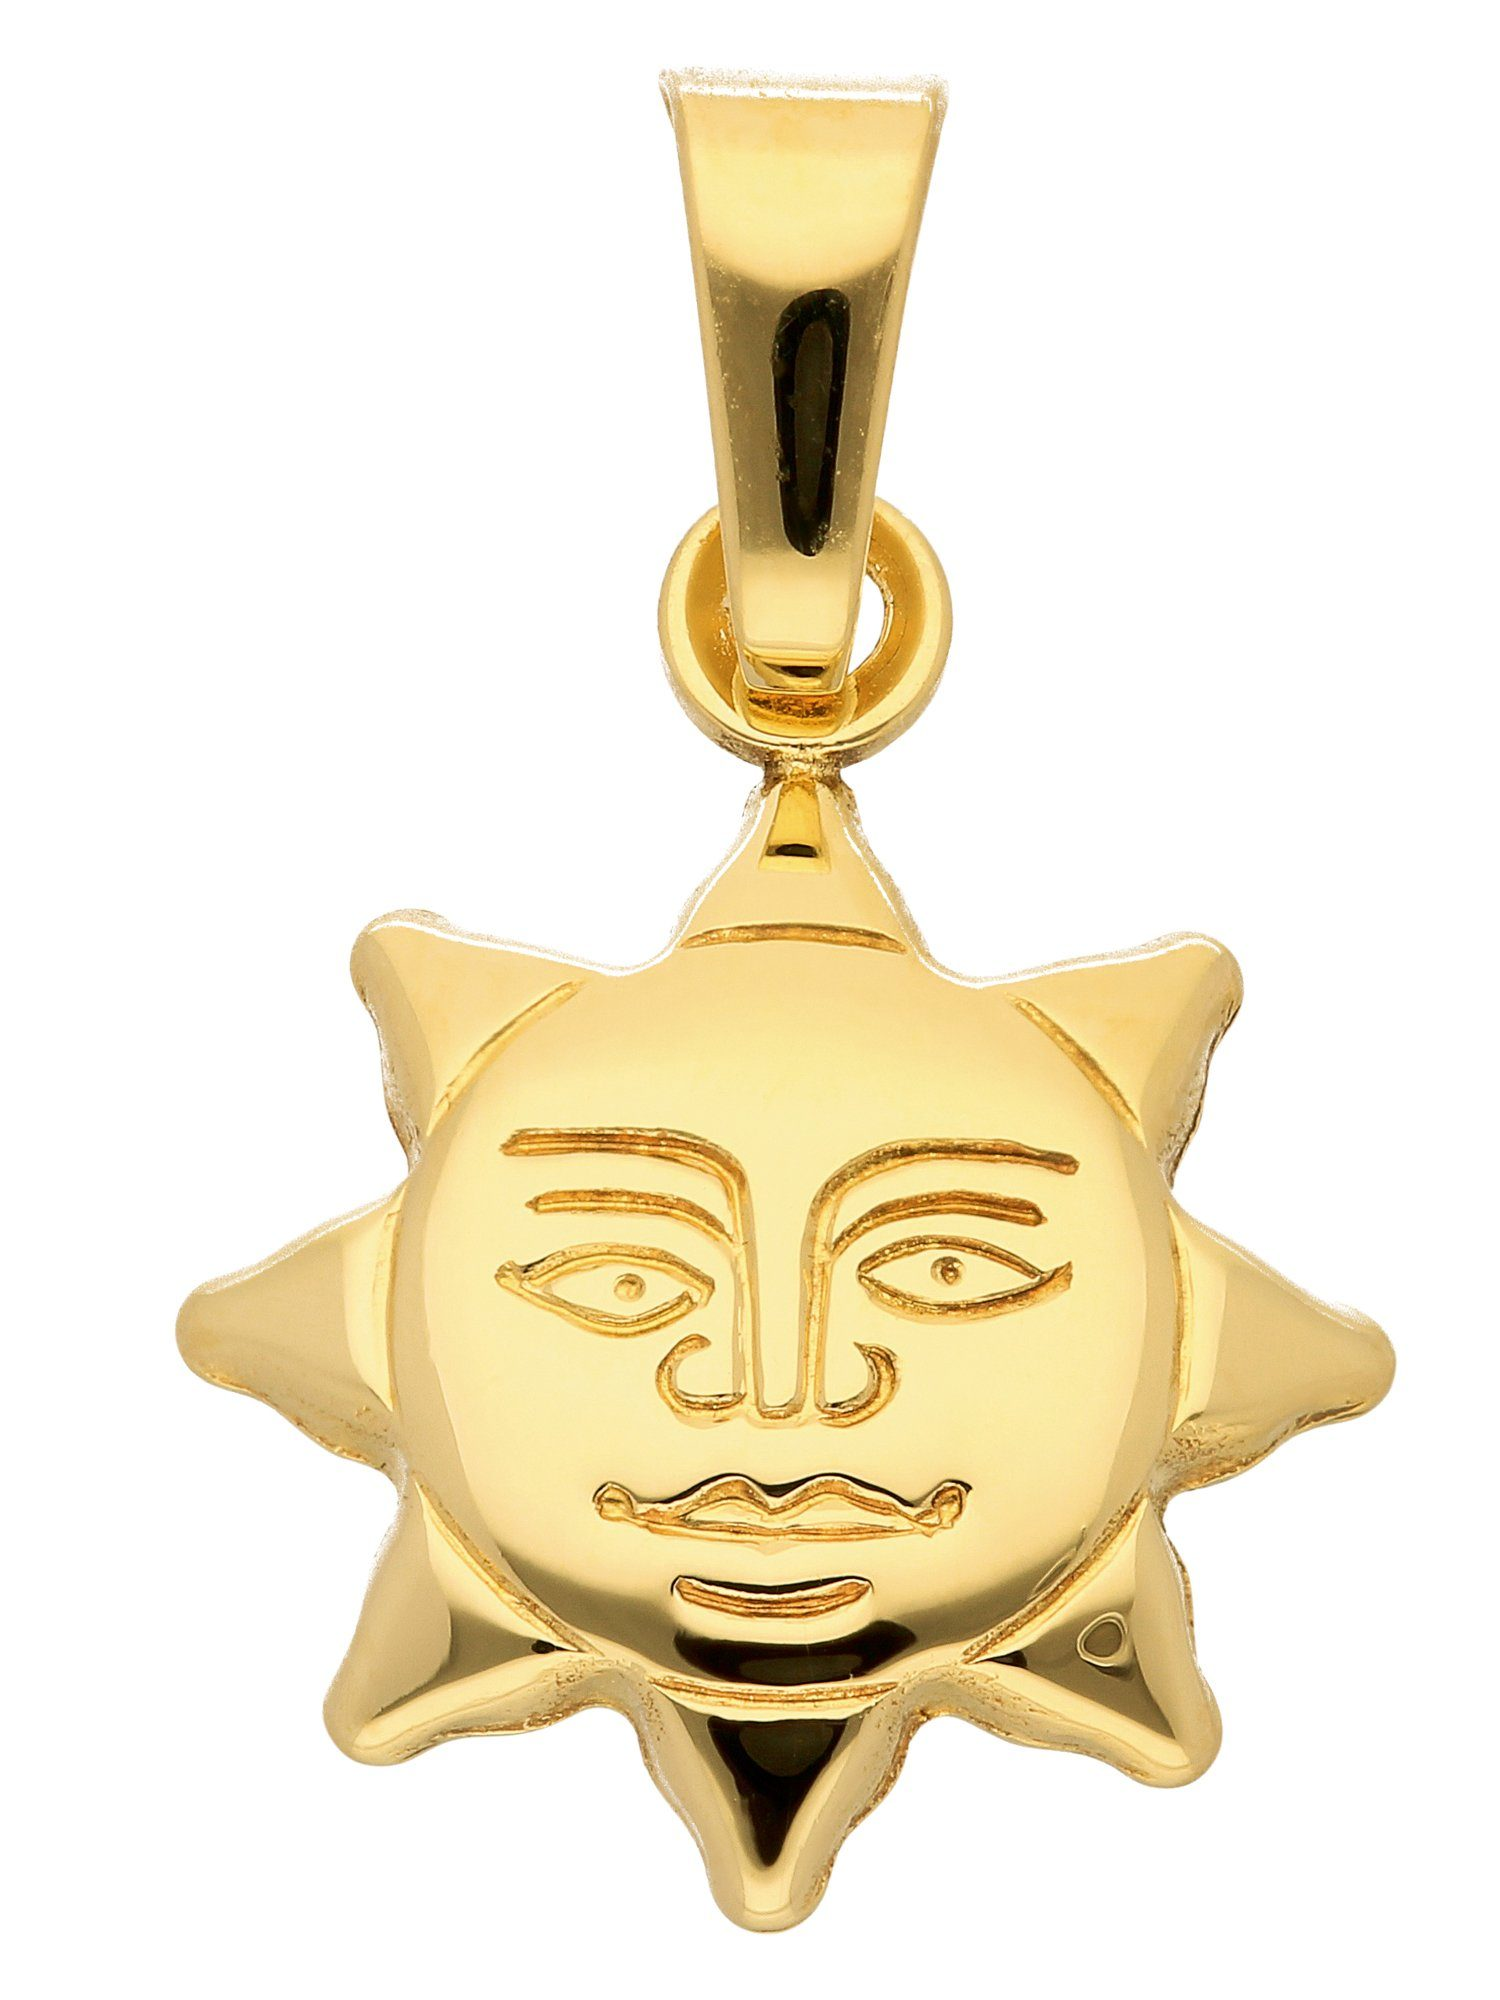 Adelia´s Kettenanhänger »Gold 8 k (333) Motiv - Anhänger« Sonne 8 k 333 Gelbgold